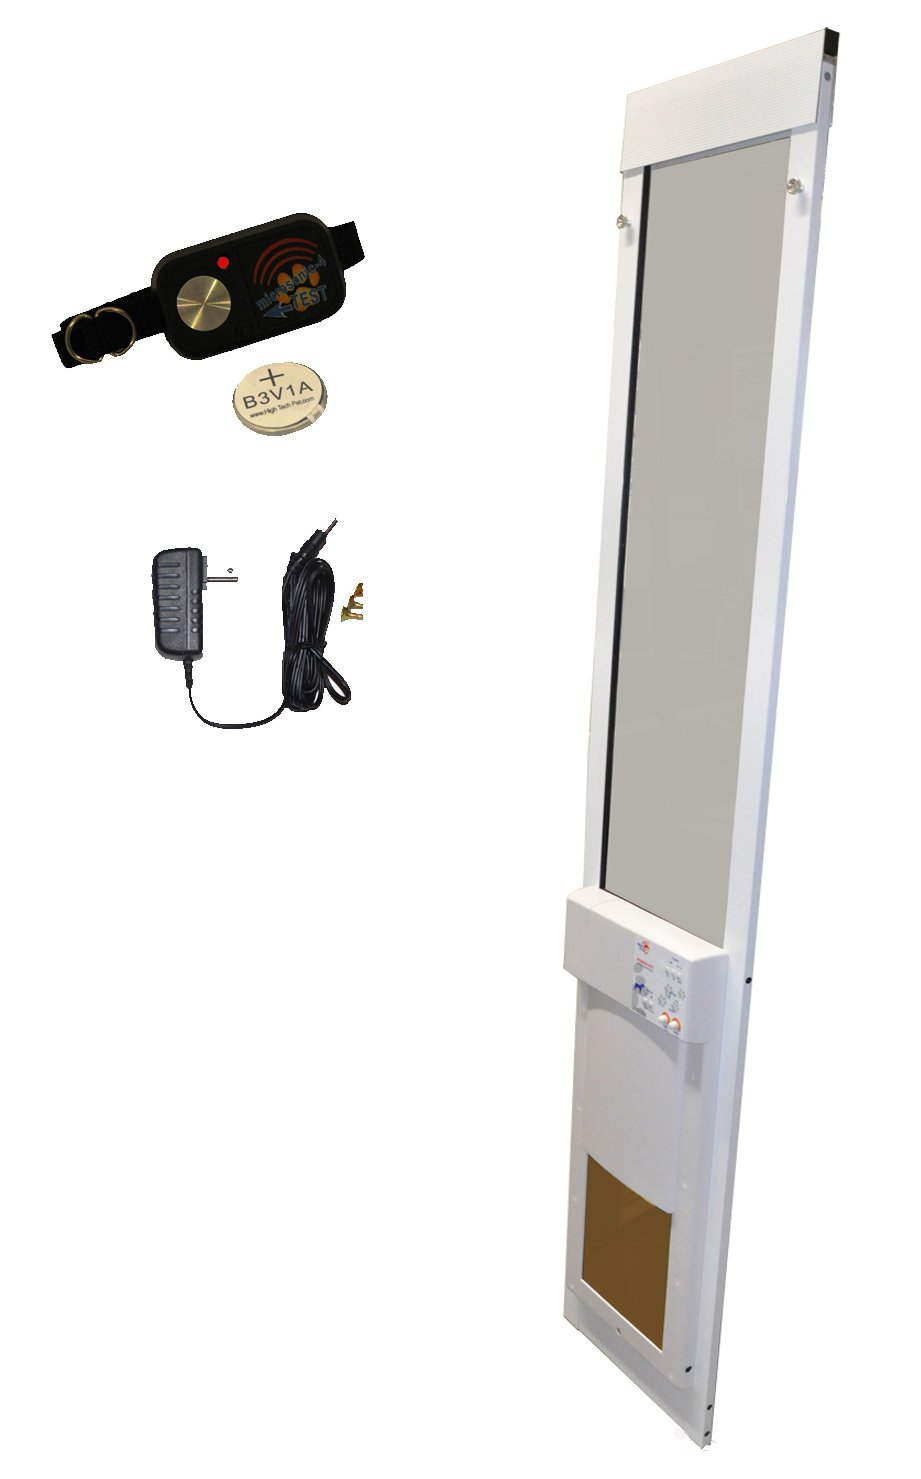 High Tech Pet - Medium Power Pet Sliding Glass Door for Dogs and Cats - Shorty